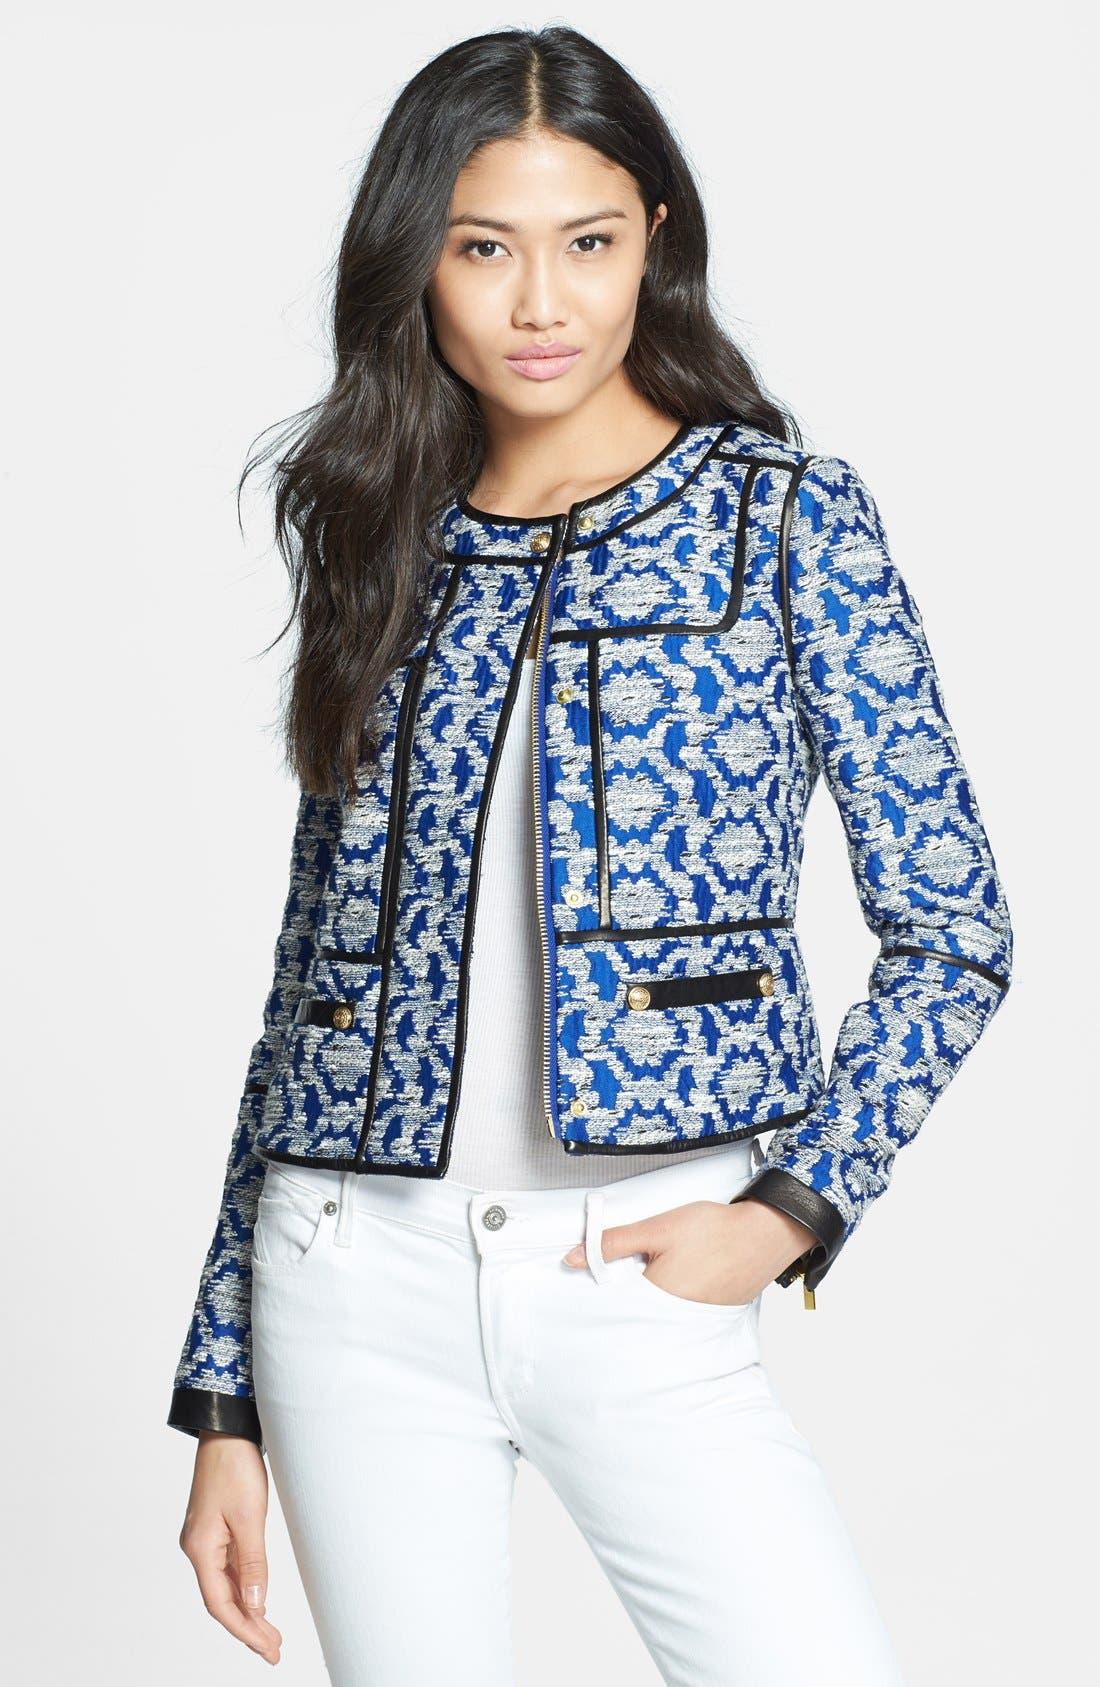 Main Image - Diane von Furstenberg 'Maelee' Crop Jacquard Jacket